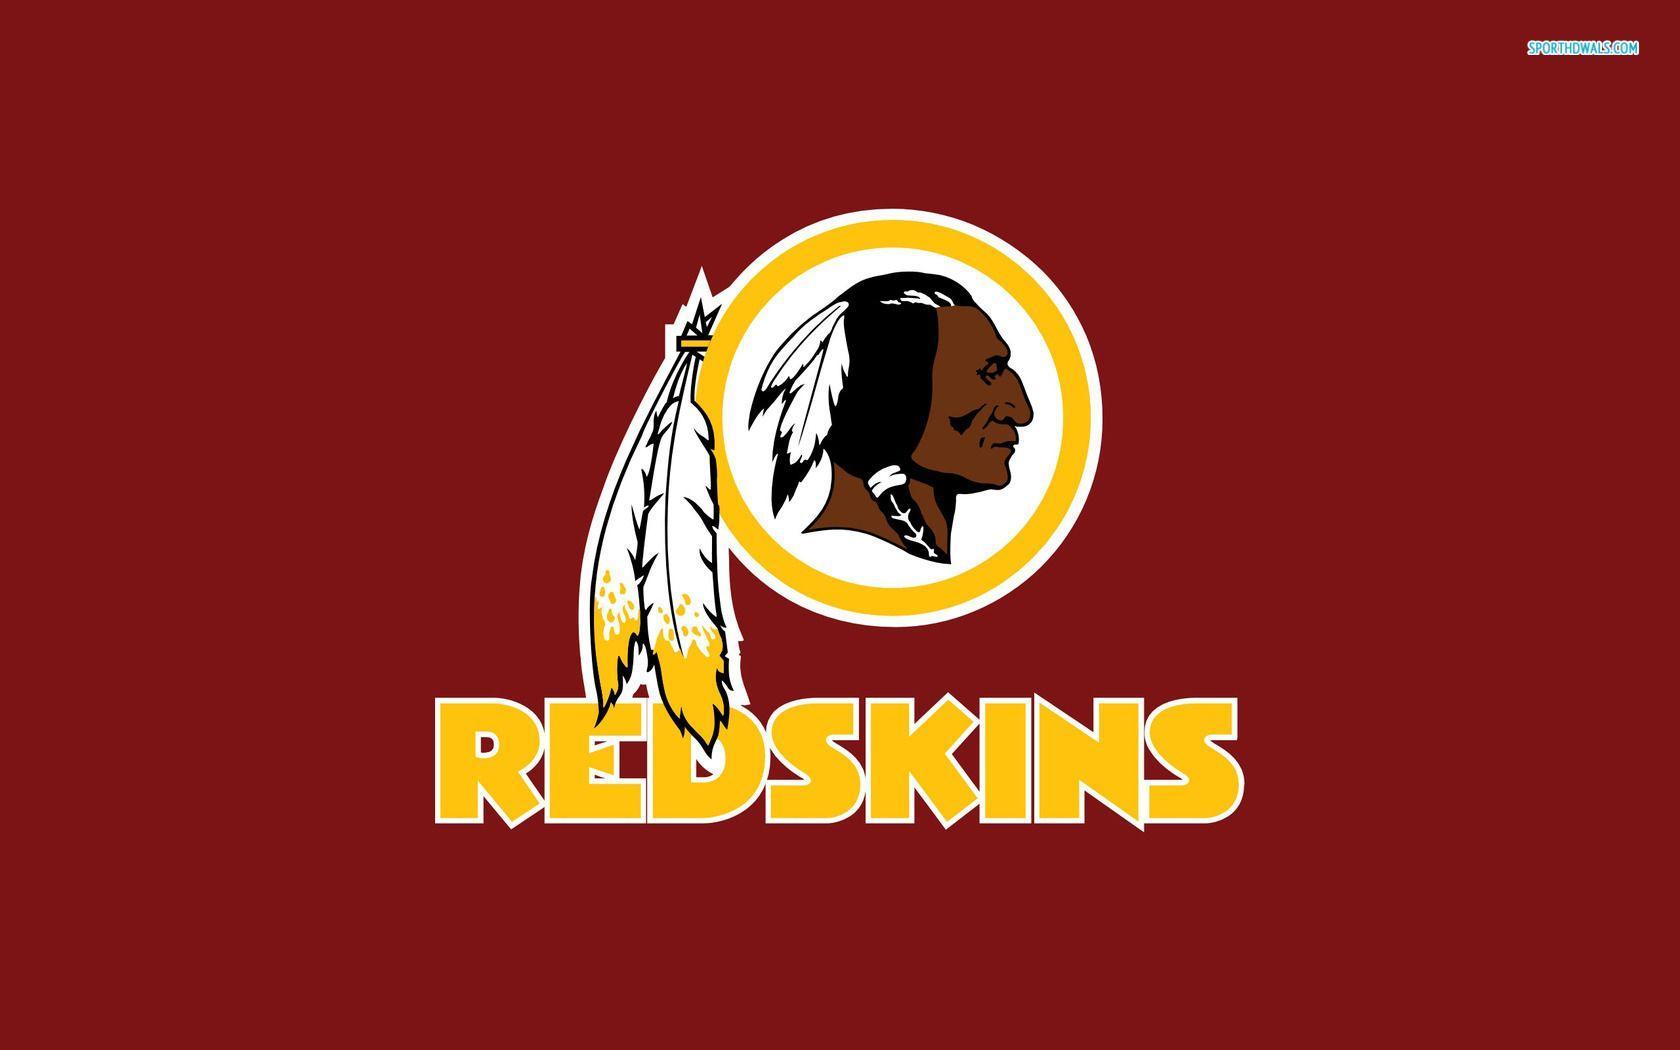 Redskins Wallpapers 2016 Wallpaper Cave